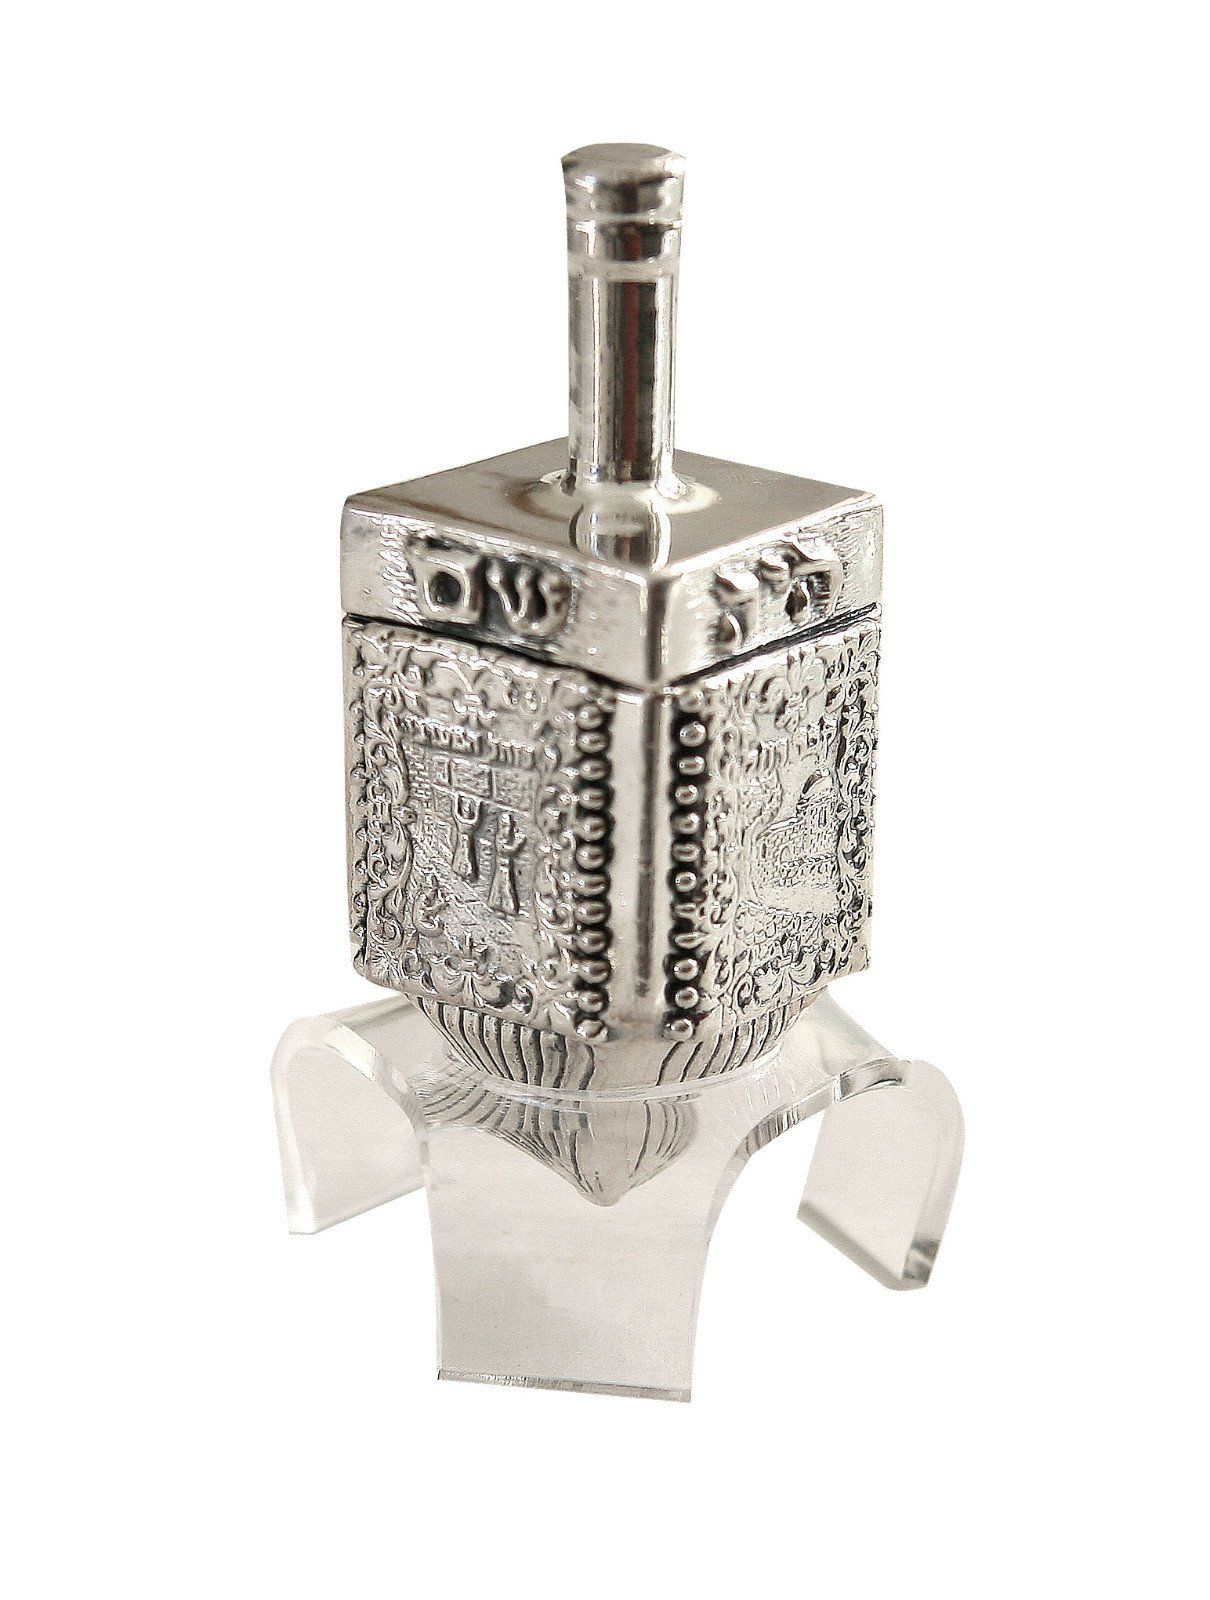 Hanukkah Chanukka Big Dreidel 925 Sterling Silver, Old Jerusalem Skyline Hand Made Size: 4.0'' x 1.25'' Stand Optional